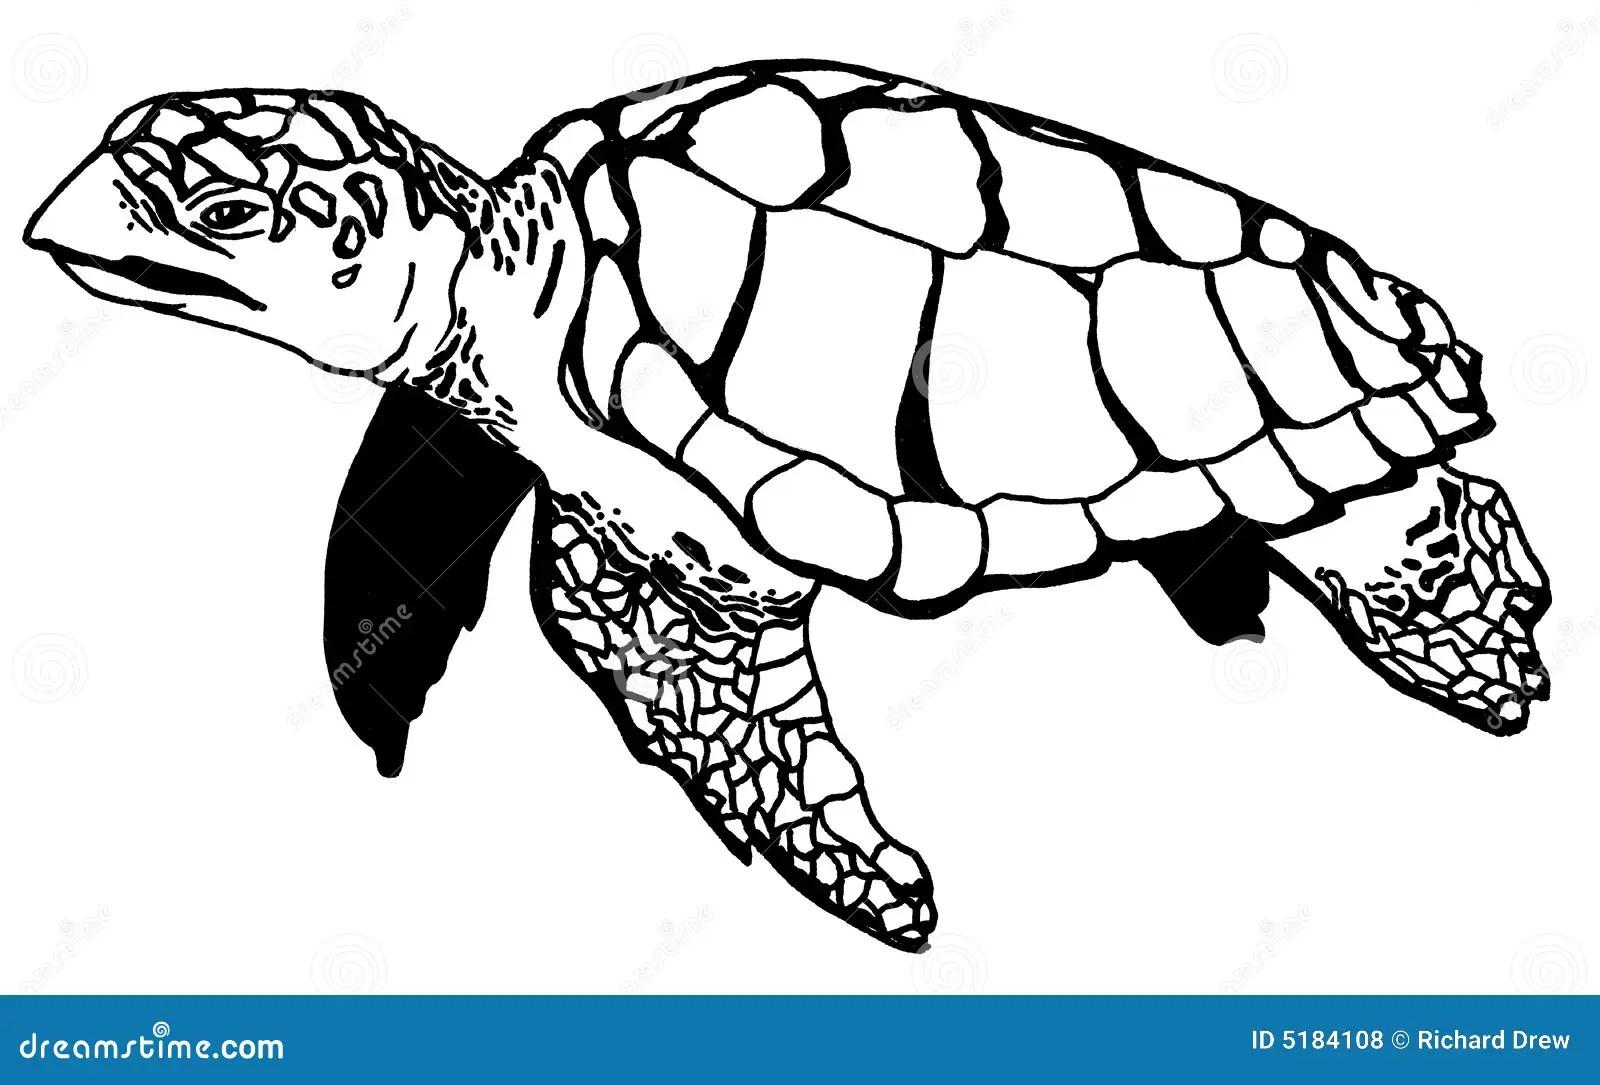 Realistic Turtle Illustraction Stock Illustration